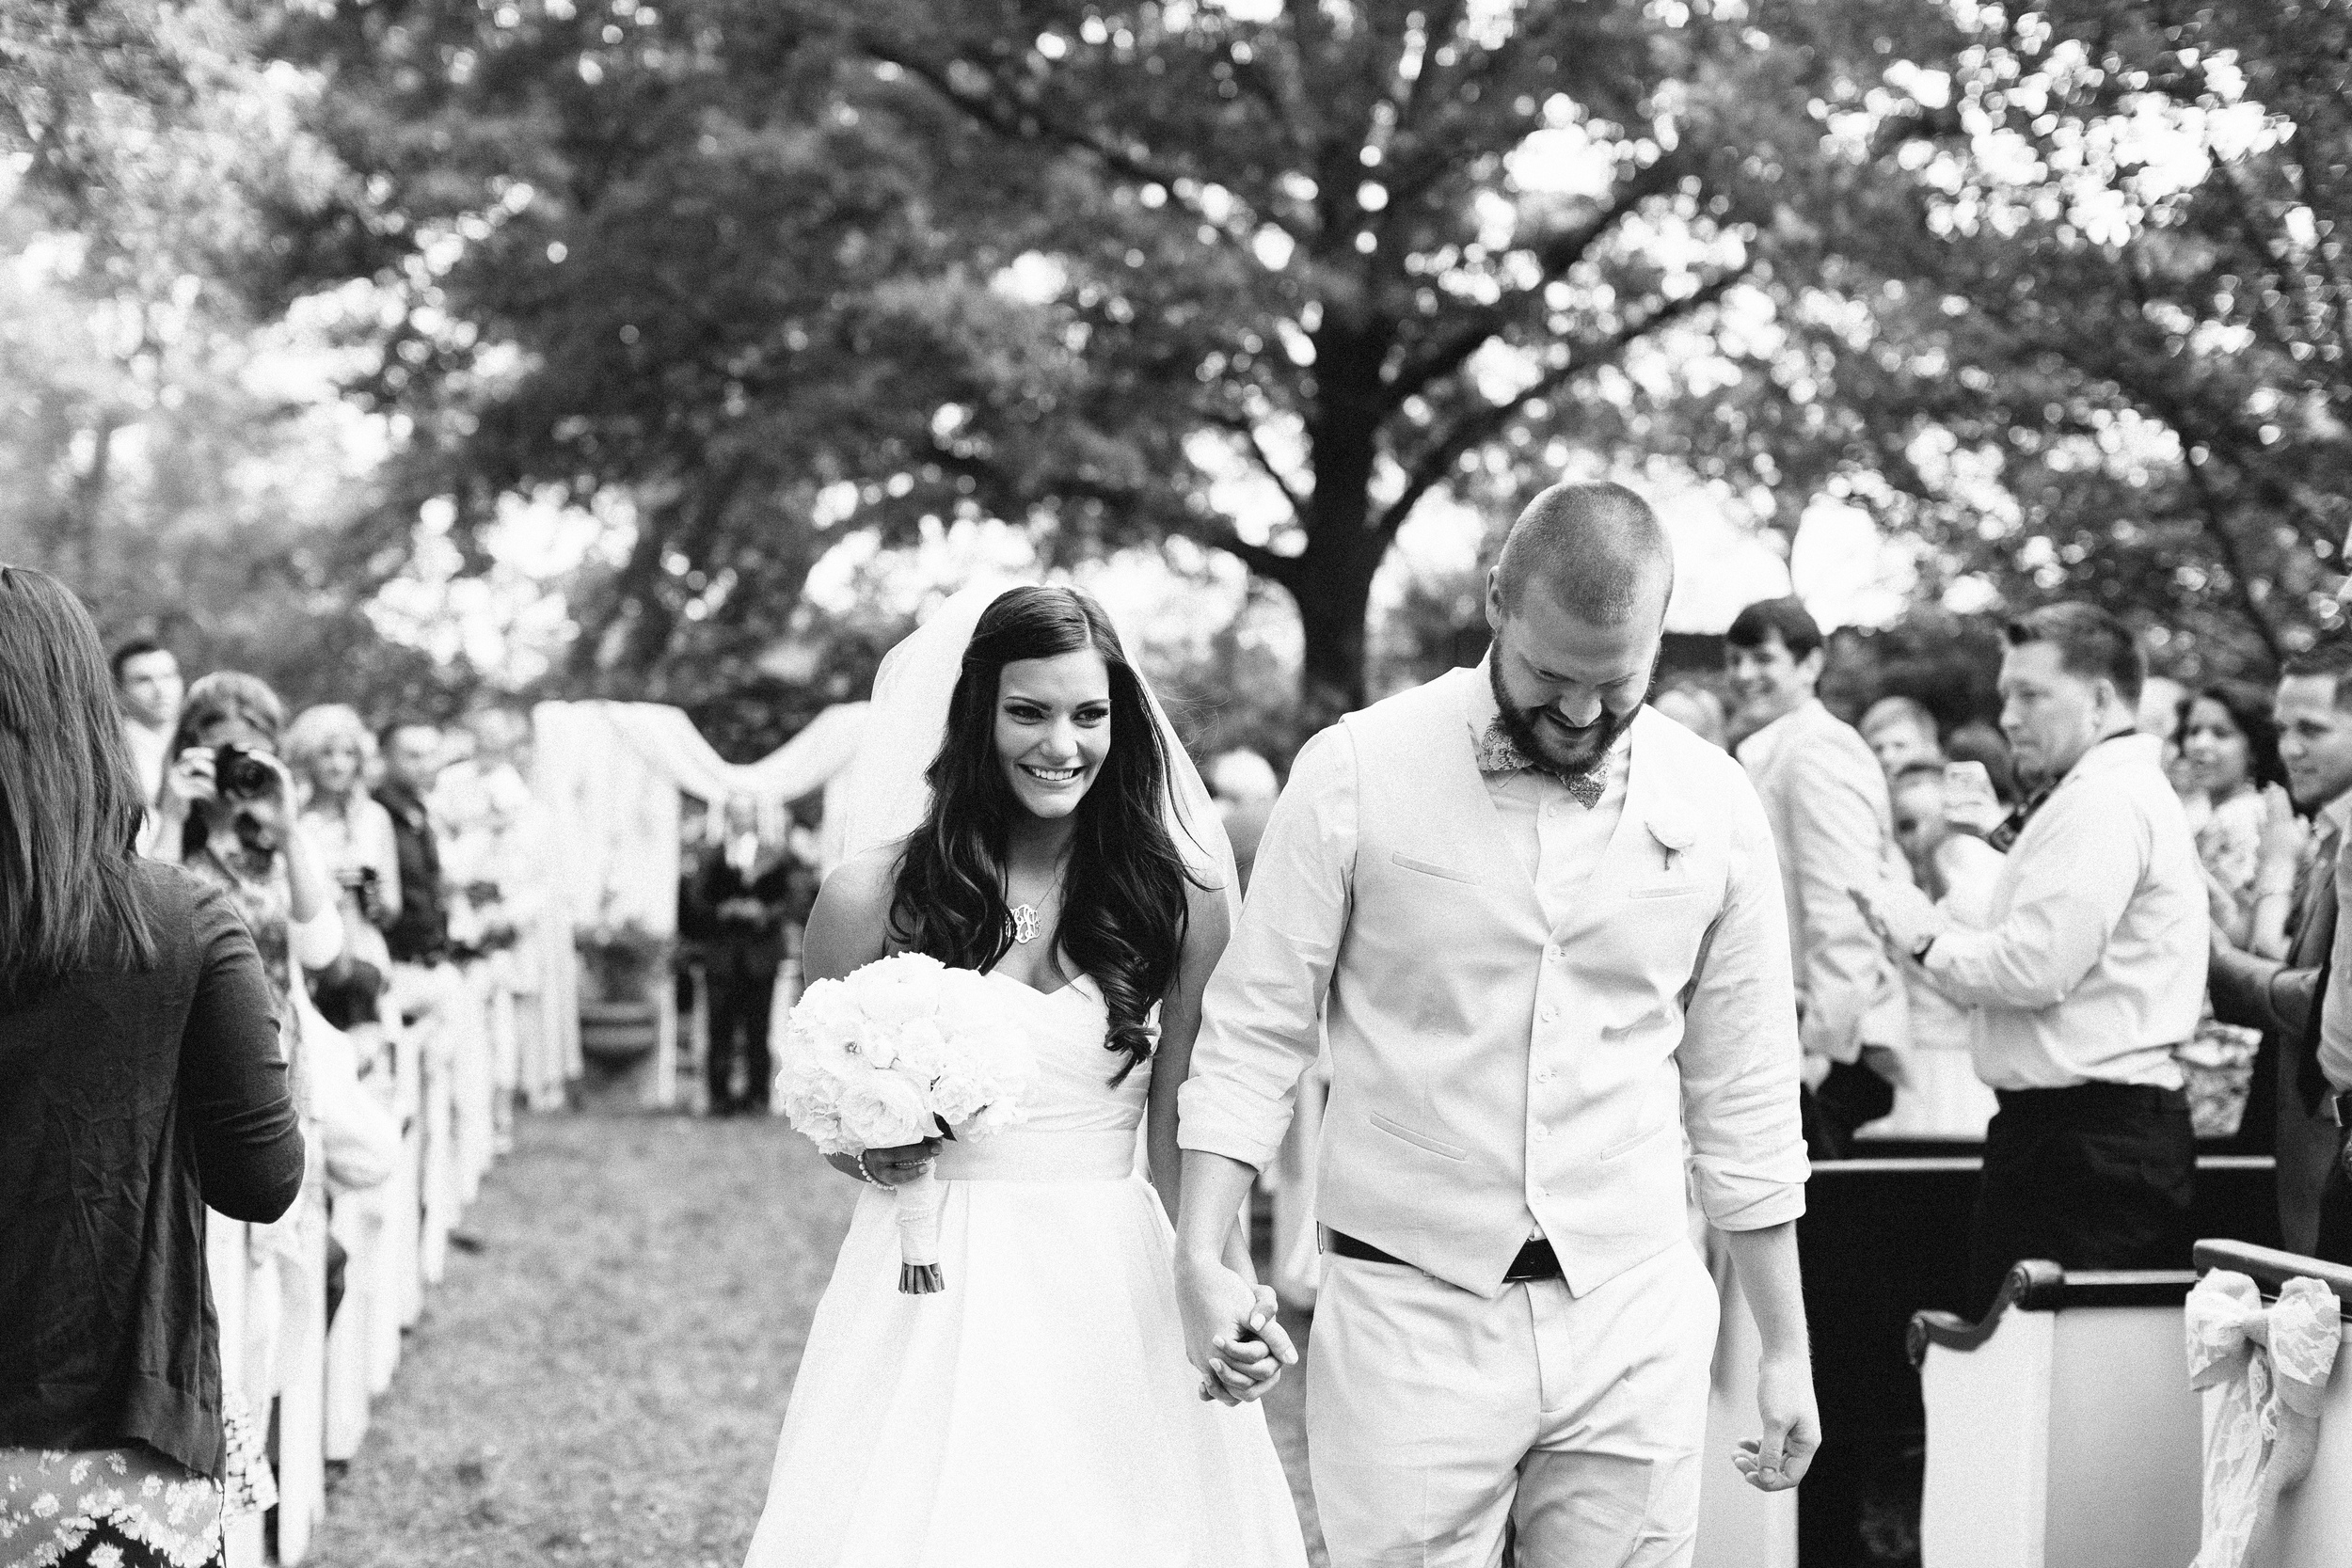 PEWS Wedding at Madison Oaks Inn - Photo by Haley Sheffield Photography